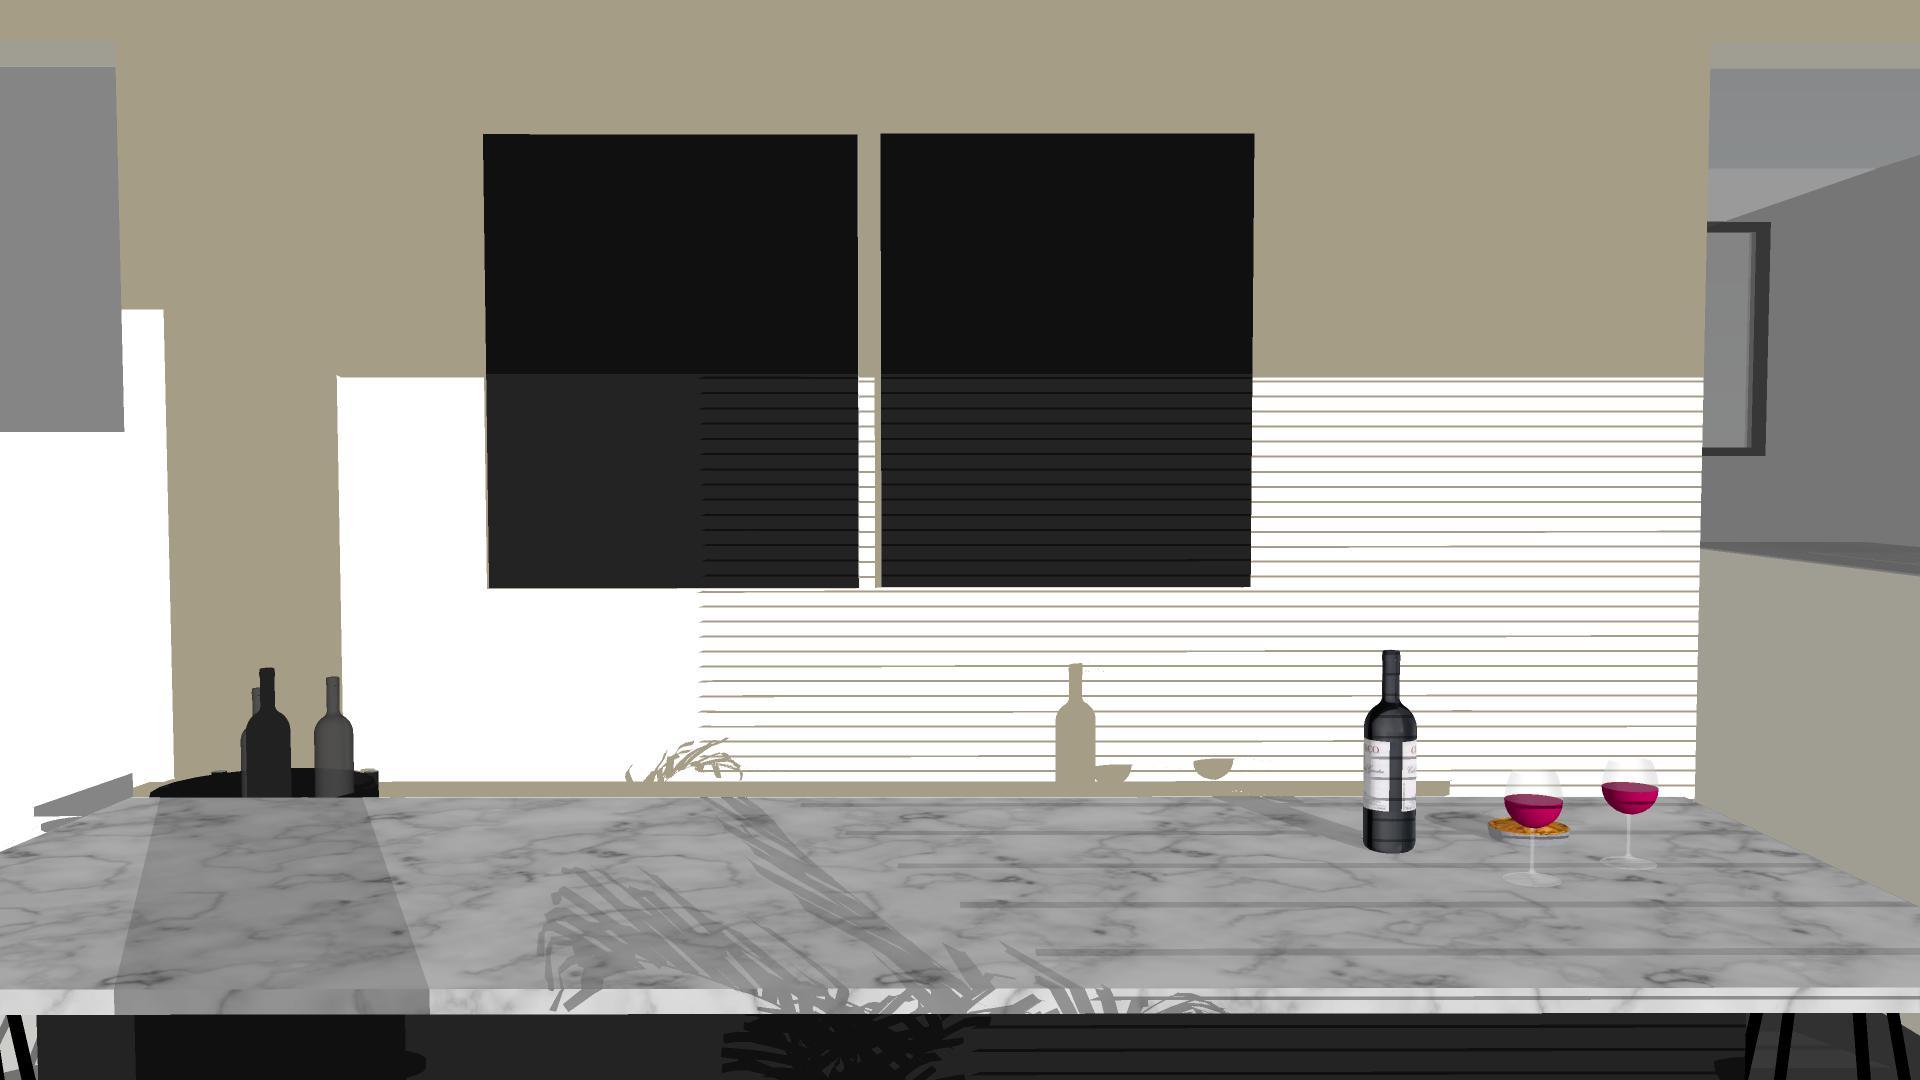 Peryton-Sketchup 6-wine bar0006.jpg